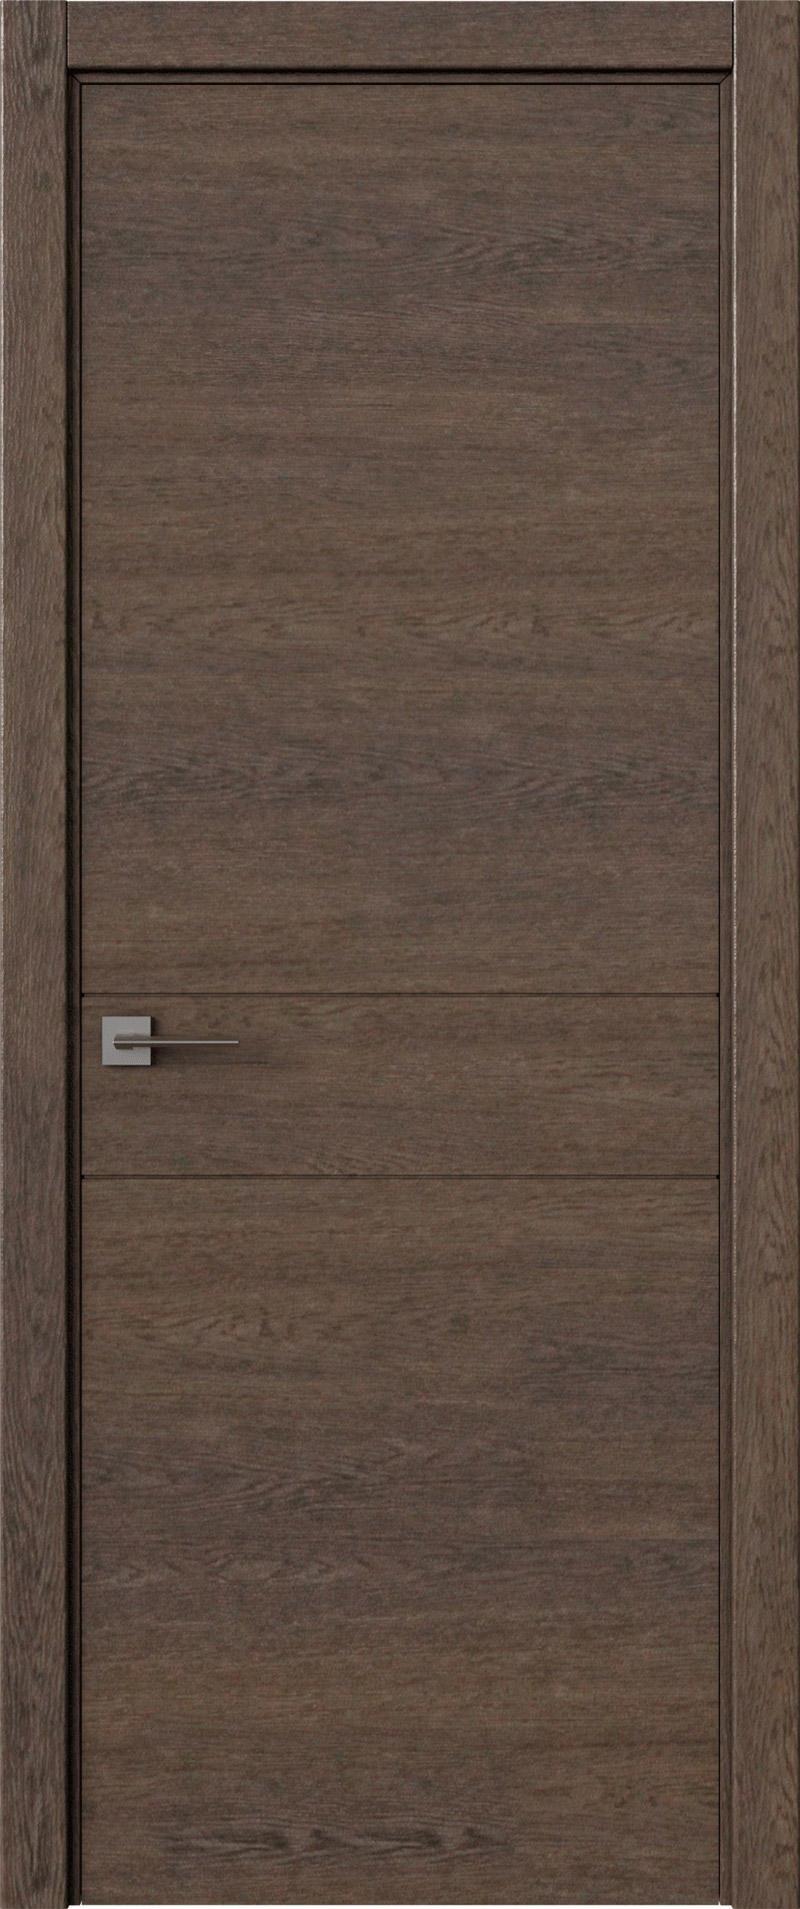 Tivoli И-2 цвет - Дуб антик Без стекла (ДГ)